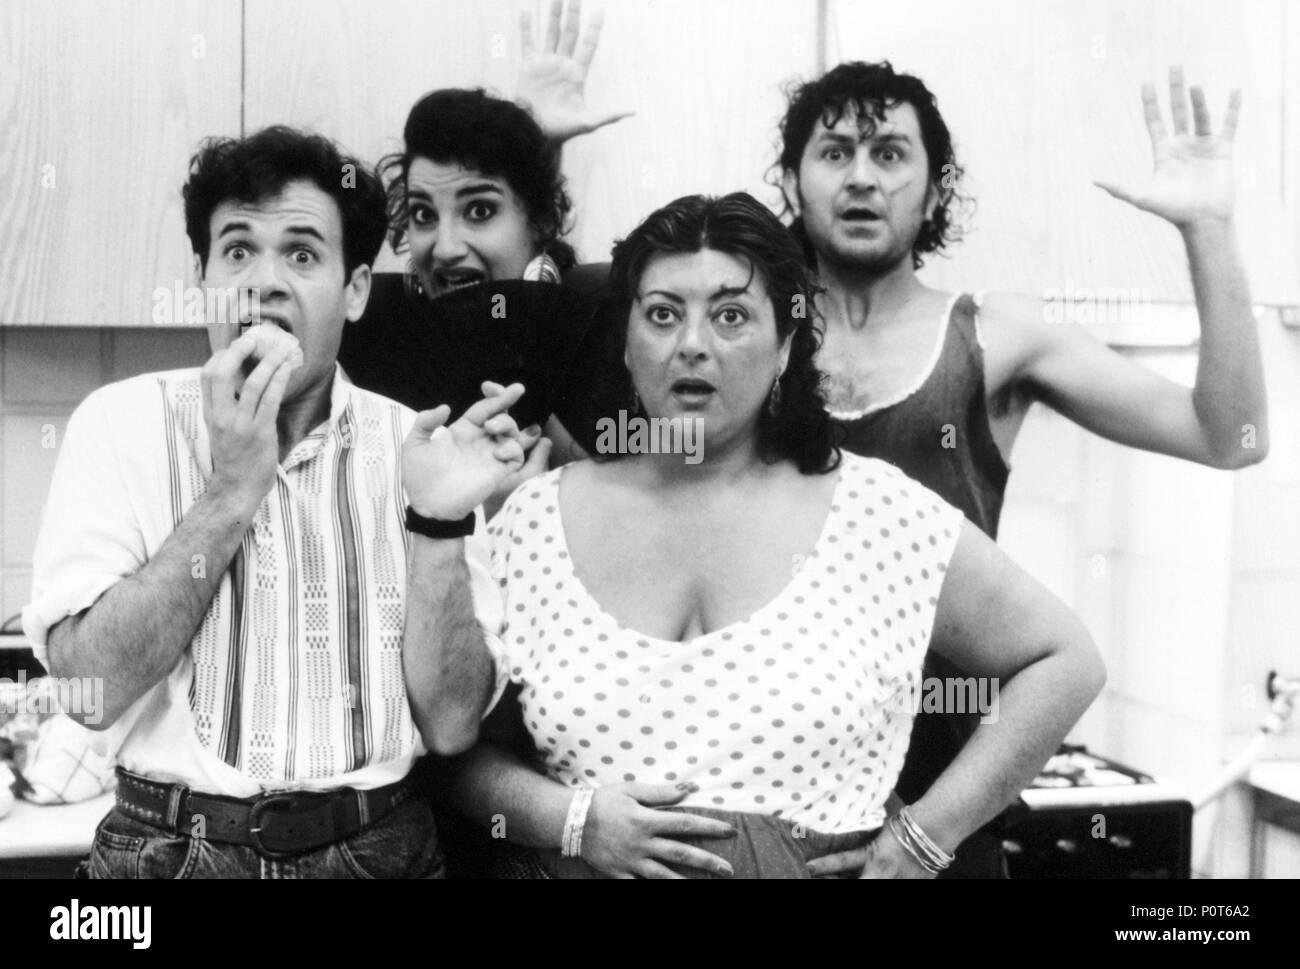 Original Film Title: QUE T'HI JUGUES, MARI PILI?.  English Title: QUE TE JUEGAS, MARI PILI?.  Film Director: VENTURA PONS.  Year: 1991.  Stars: AMPARO MORENO; LLOLL BERTRAN. - Stock Image